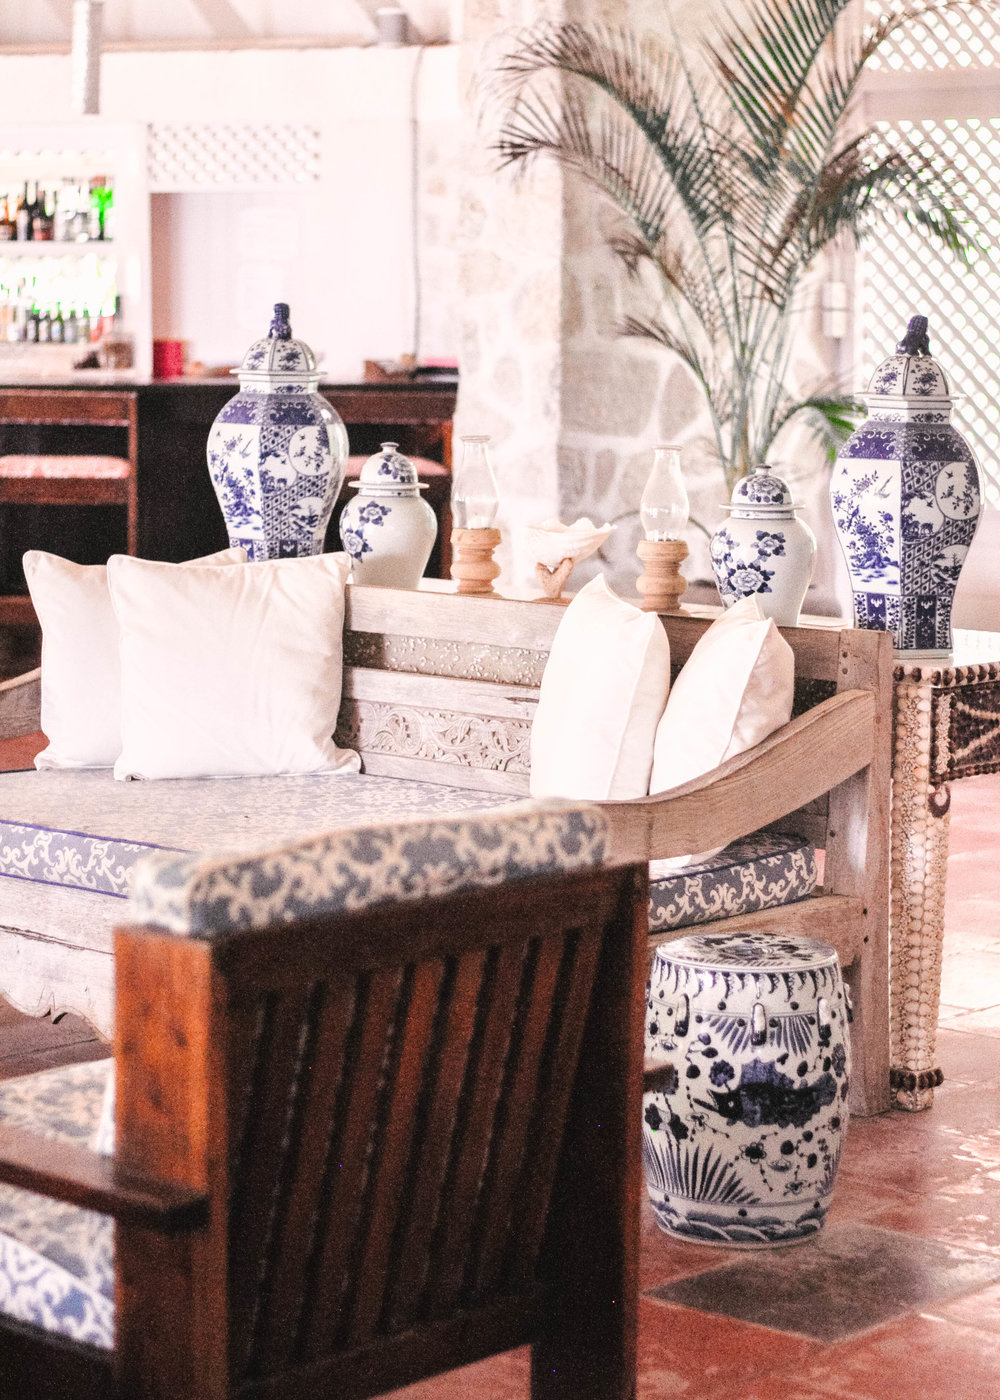 Caribbean hotel decor